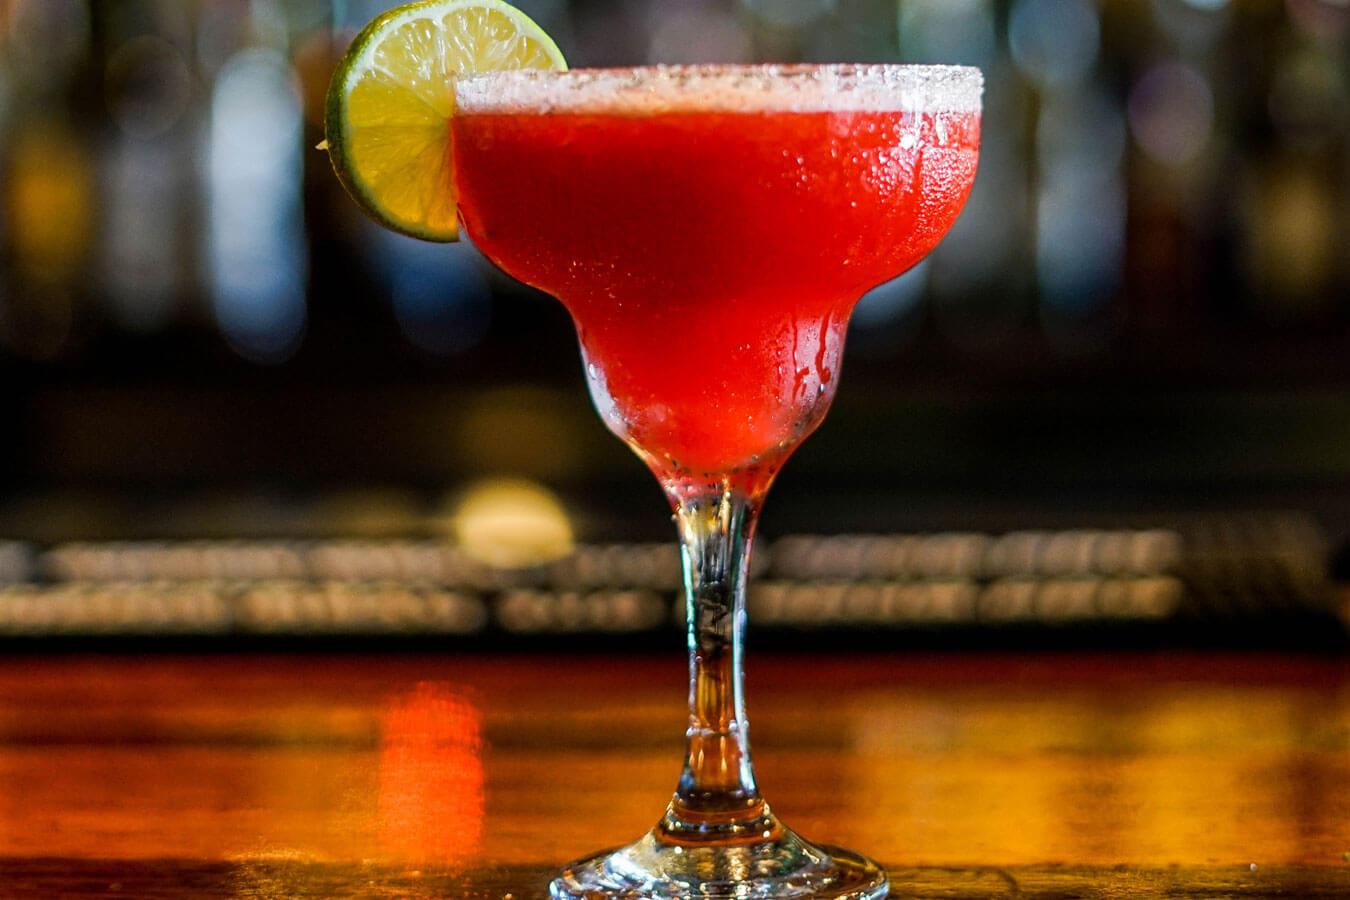 Margarita Monday at Motel SOCO's El Camino Lounge